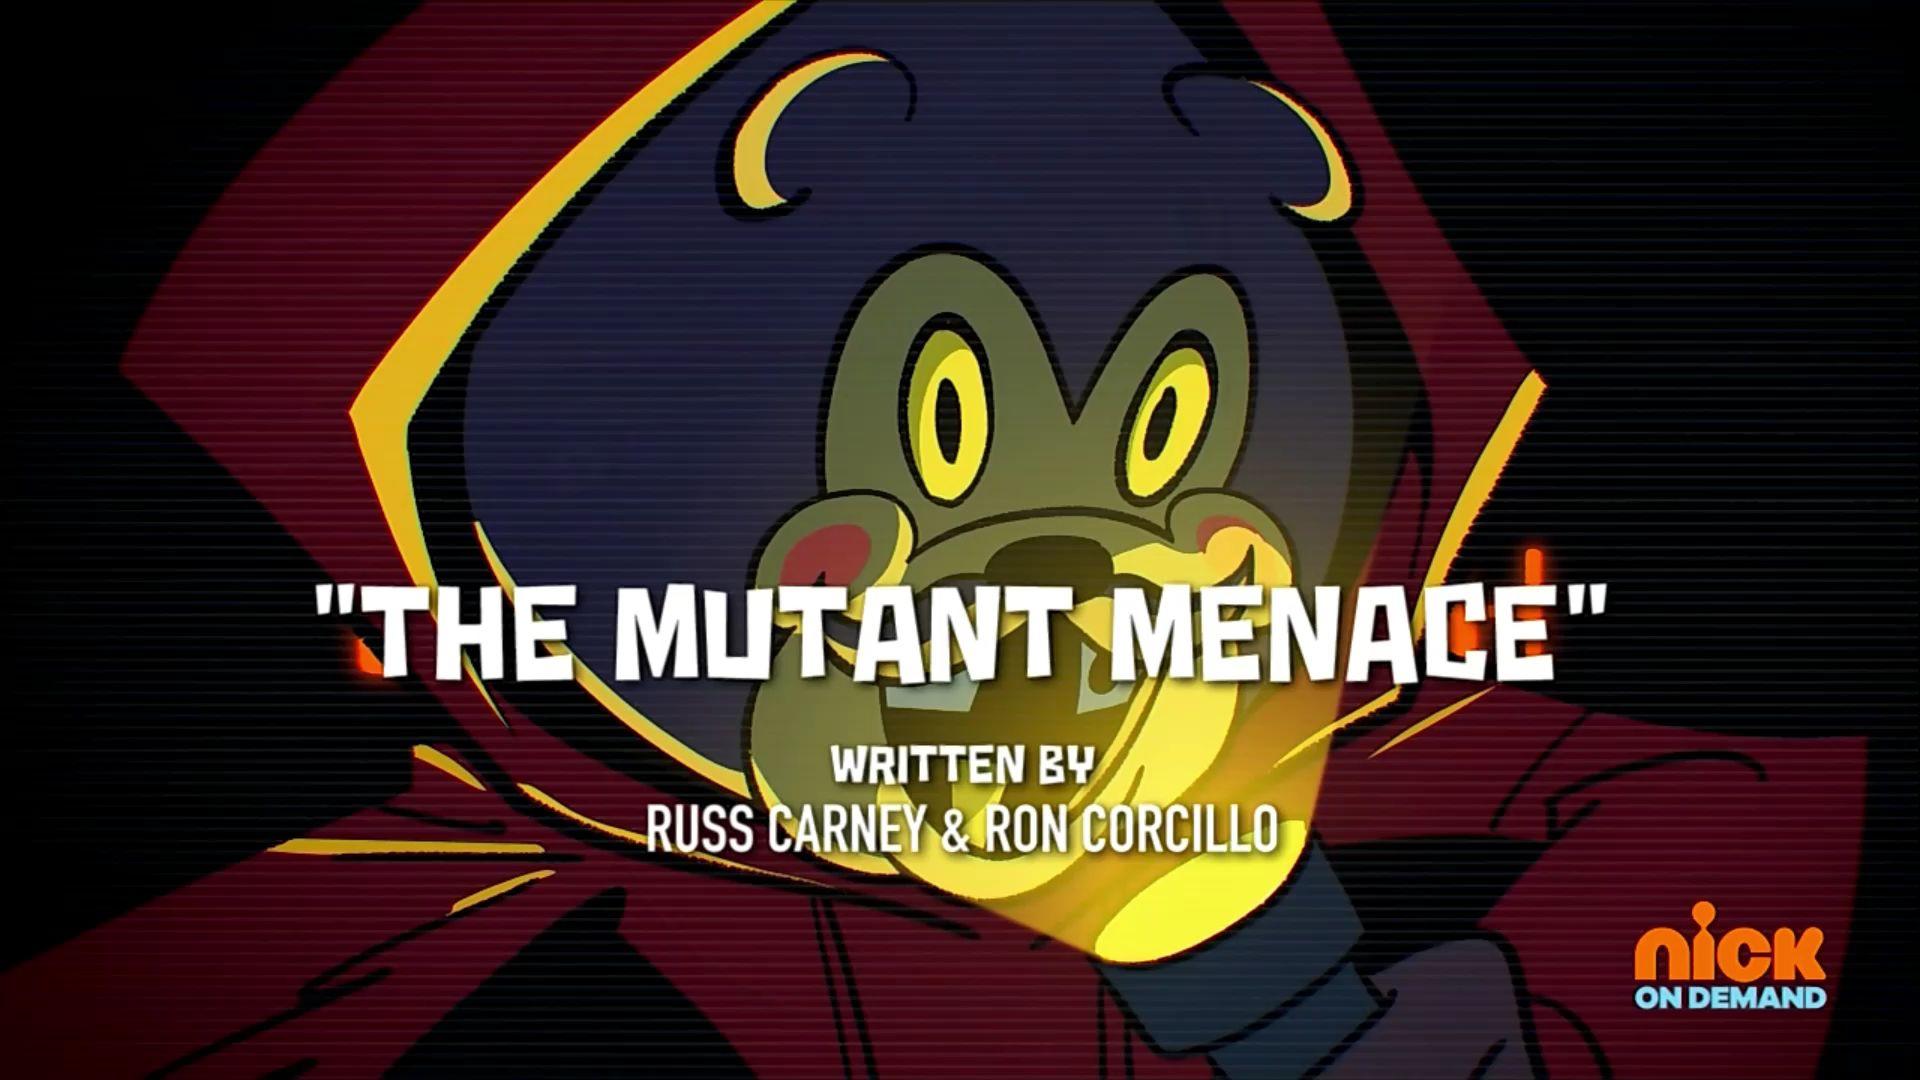 The Mutant Menace